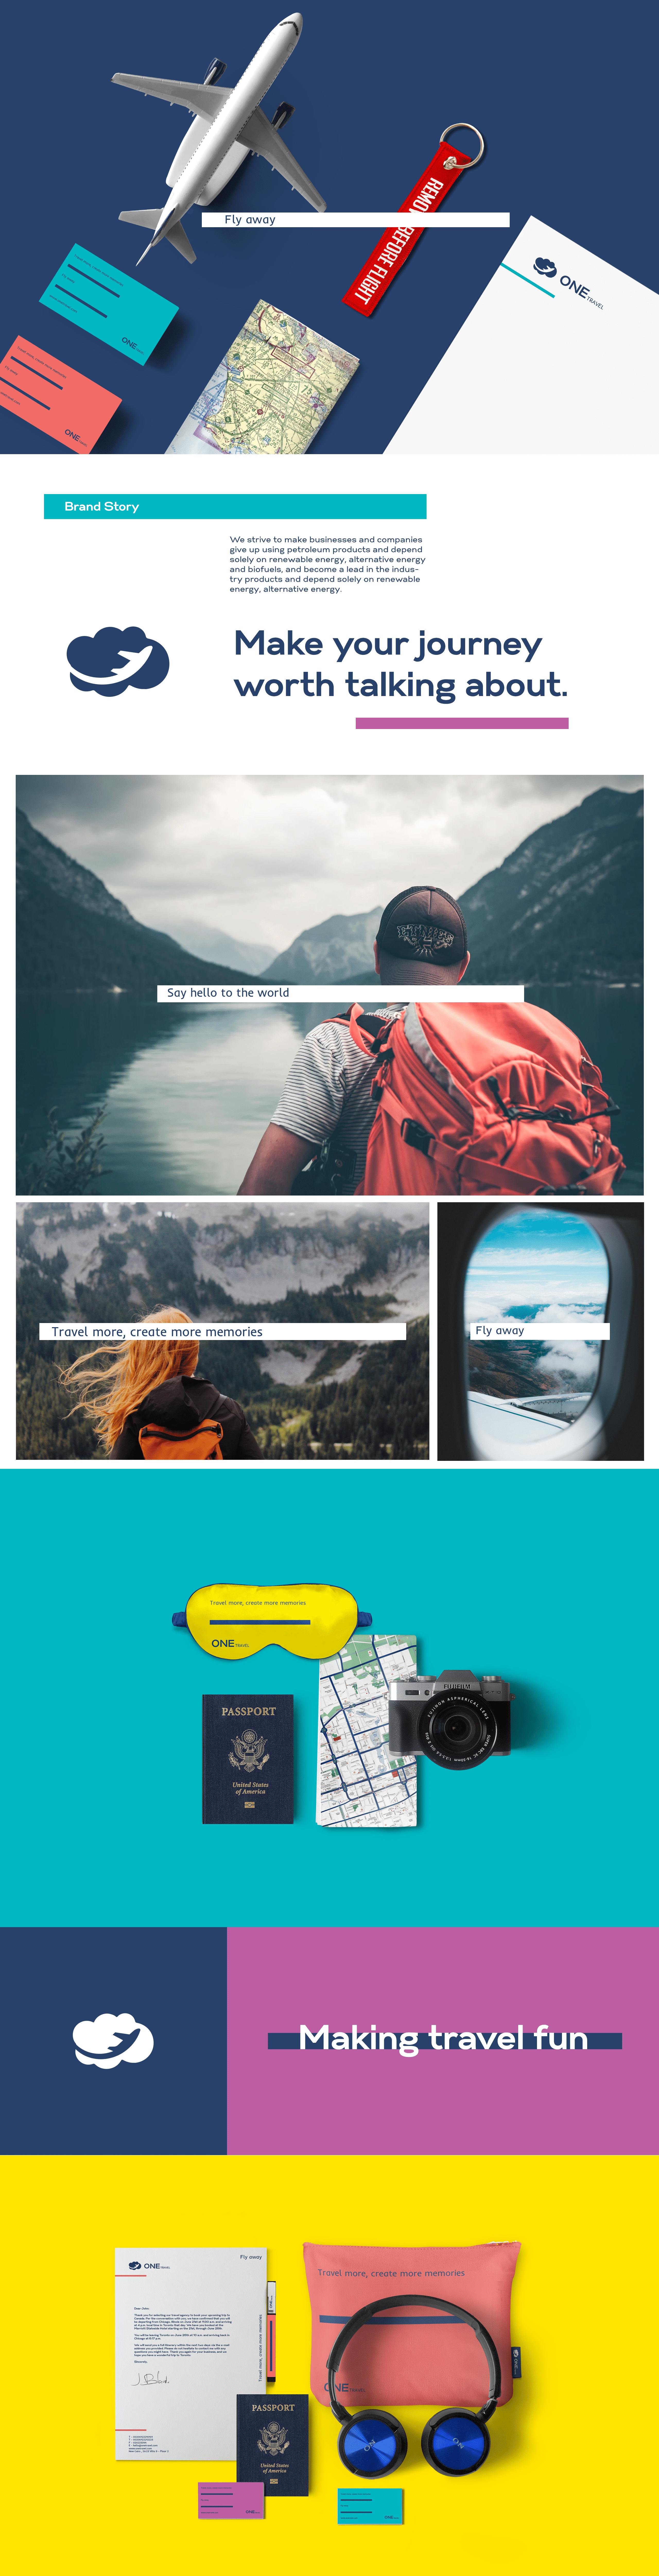 One Travel journey